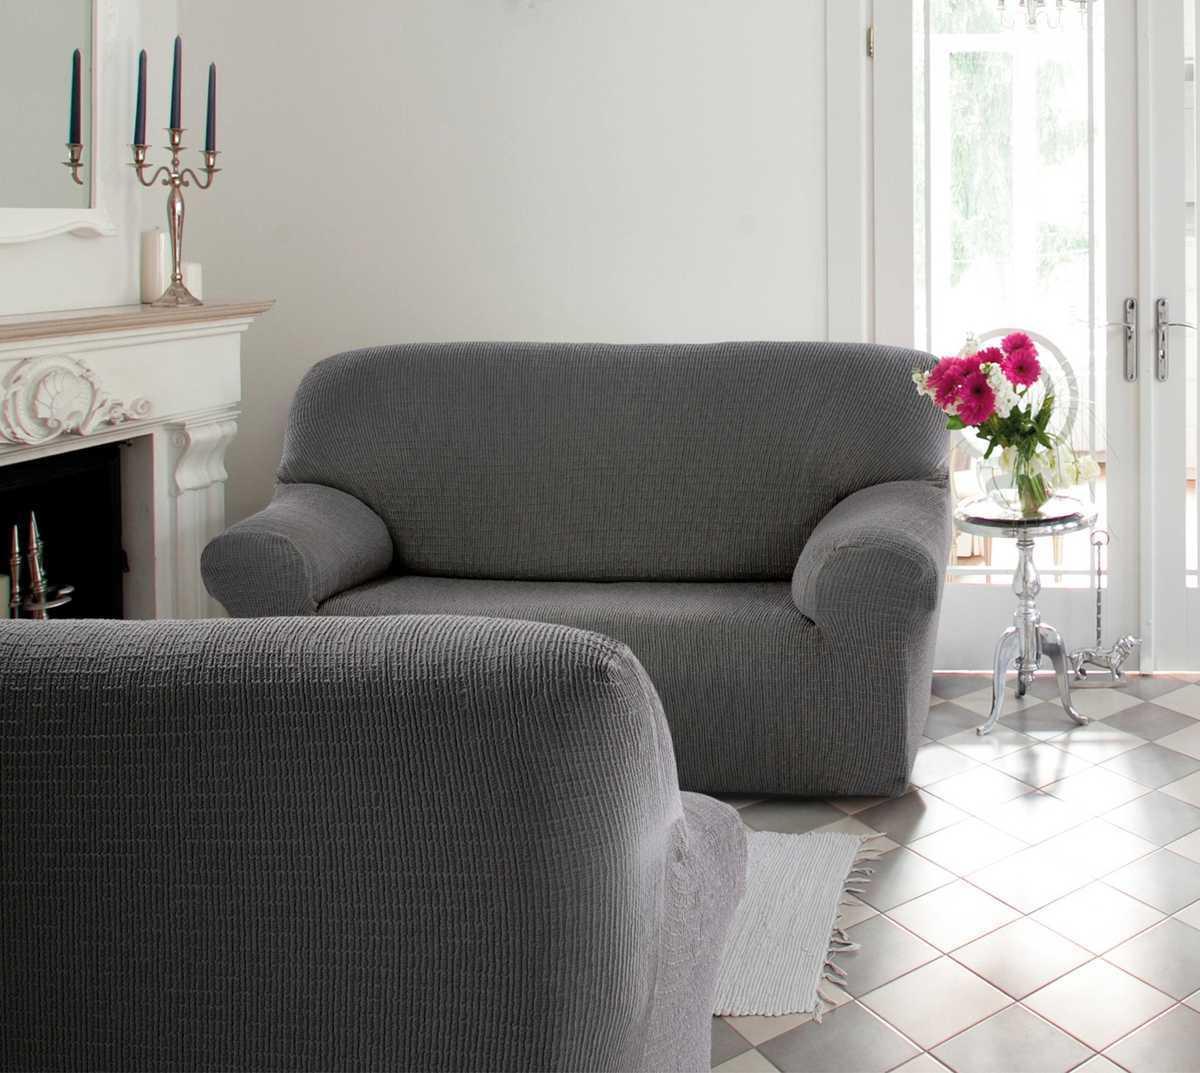 Forbyt, Potah multielastický, Cagliari, šedý křeslo 70 - 110 cm